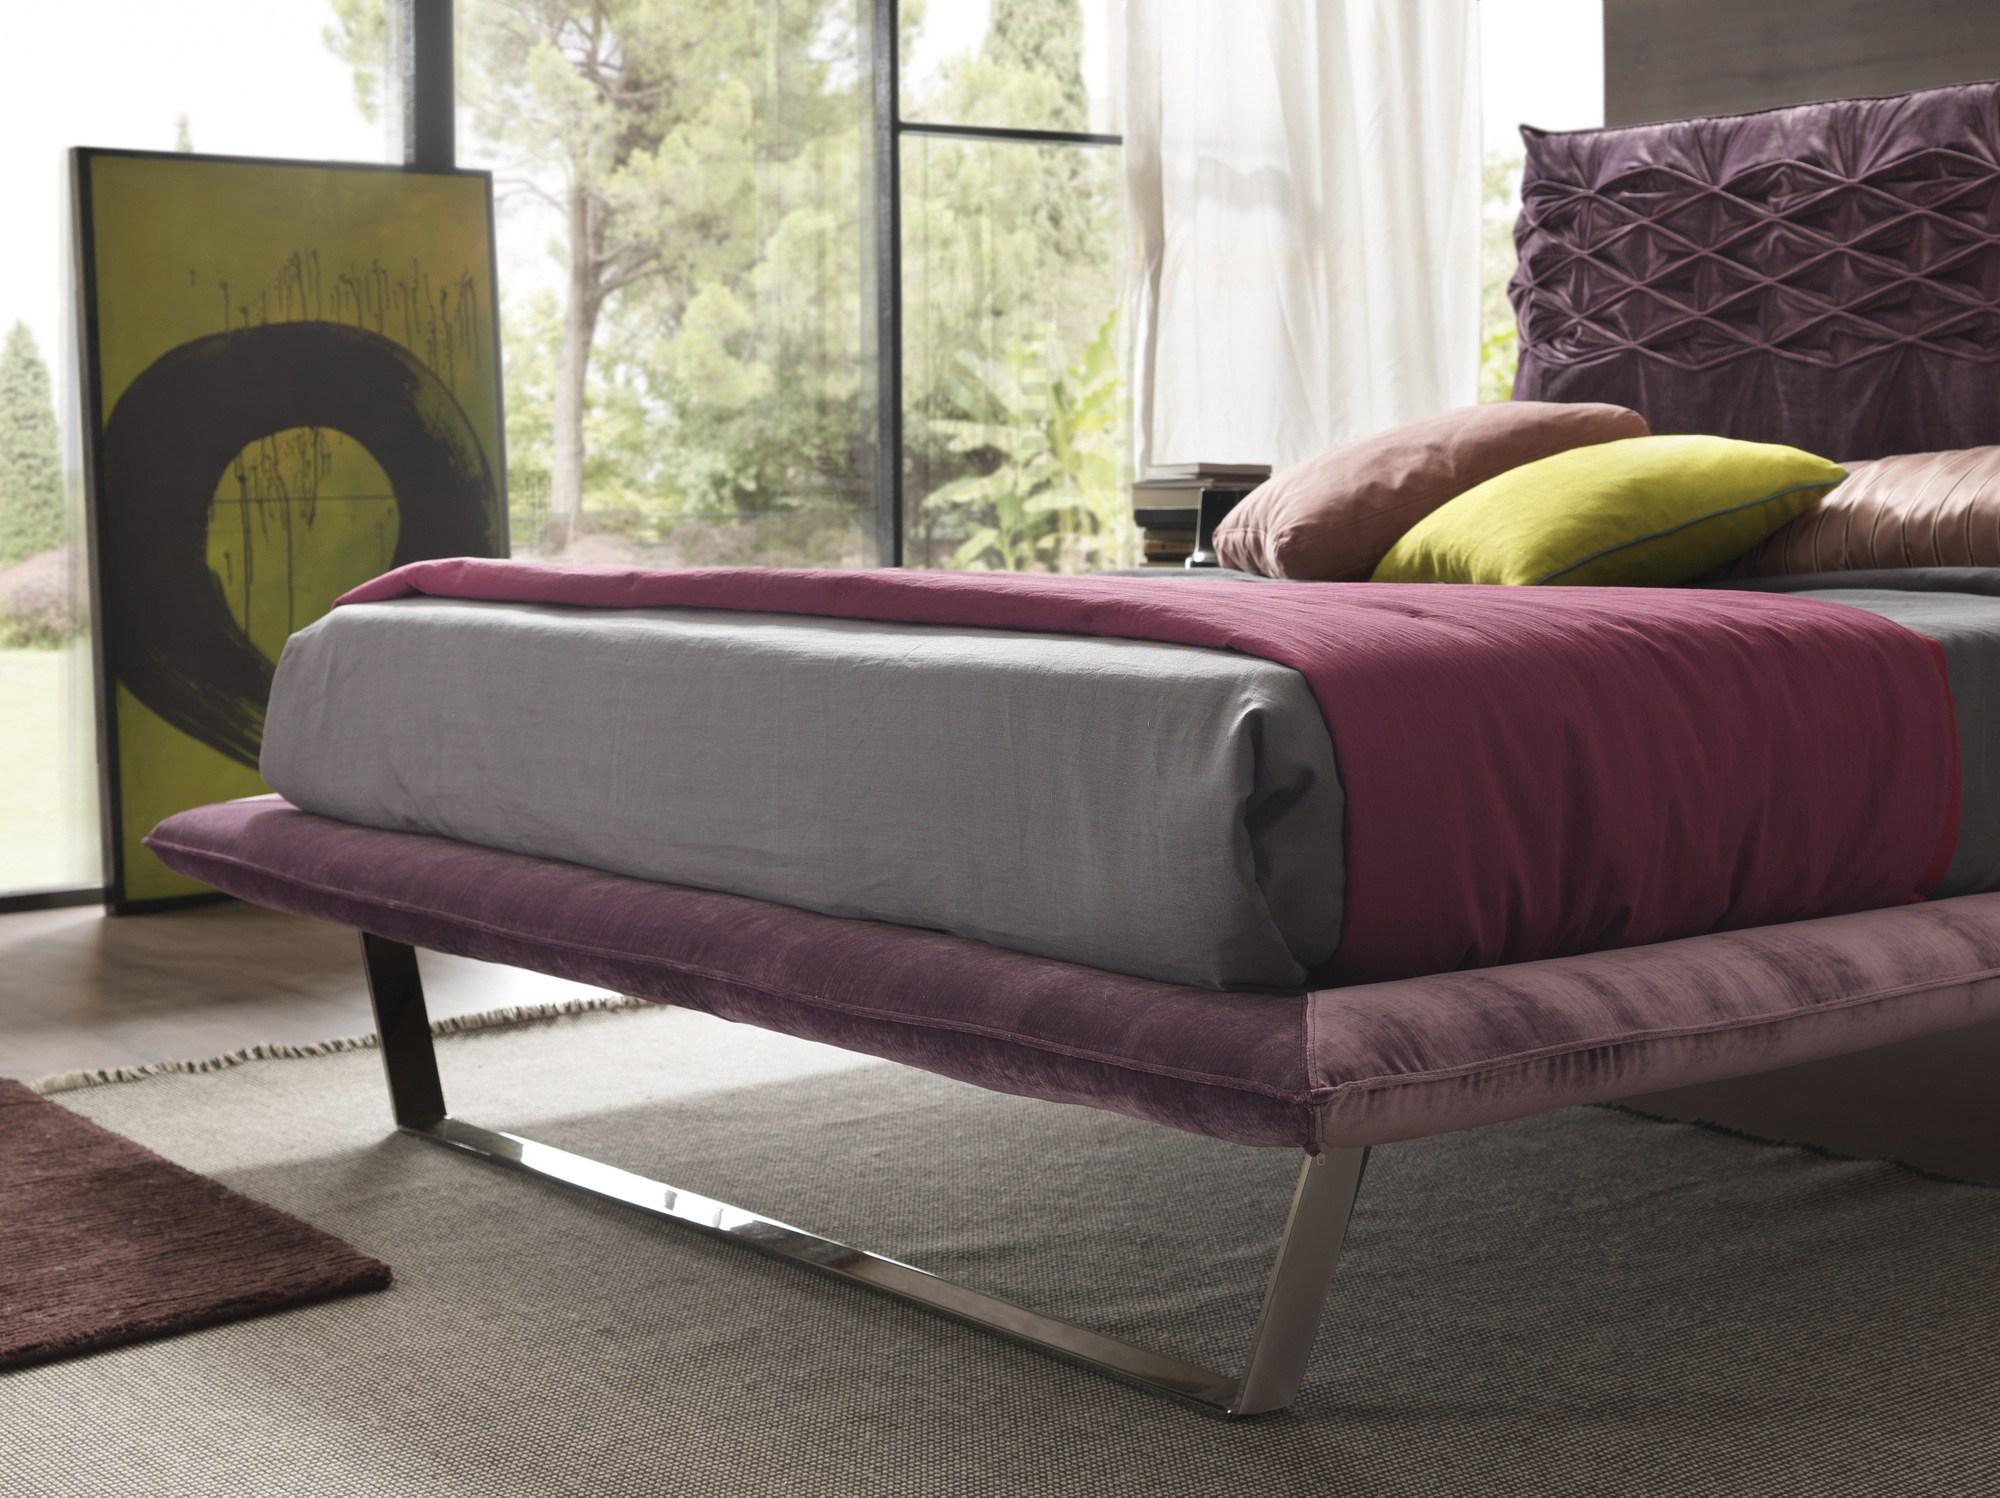 Nice Light Bed by Bolzan Letti